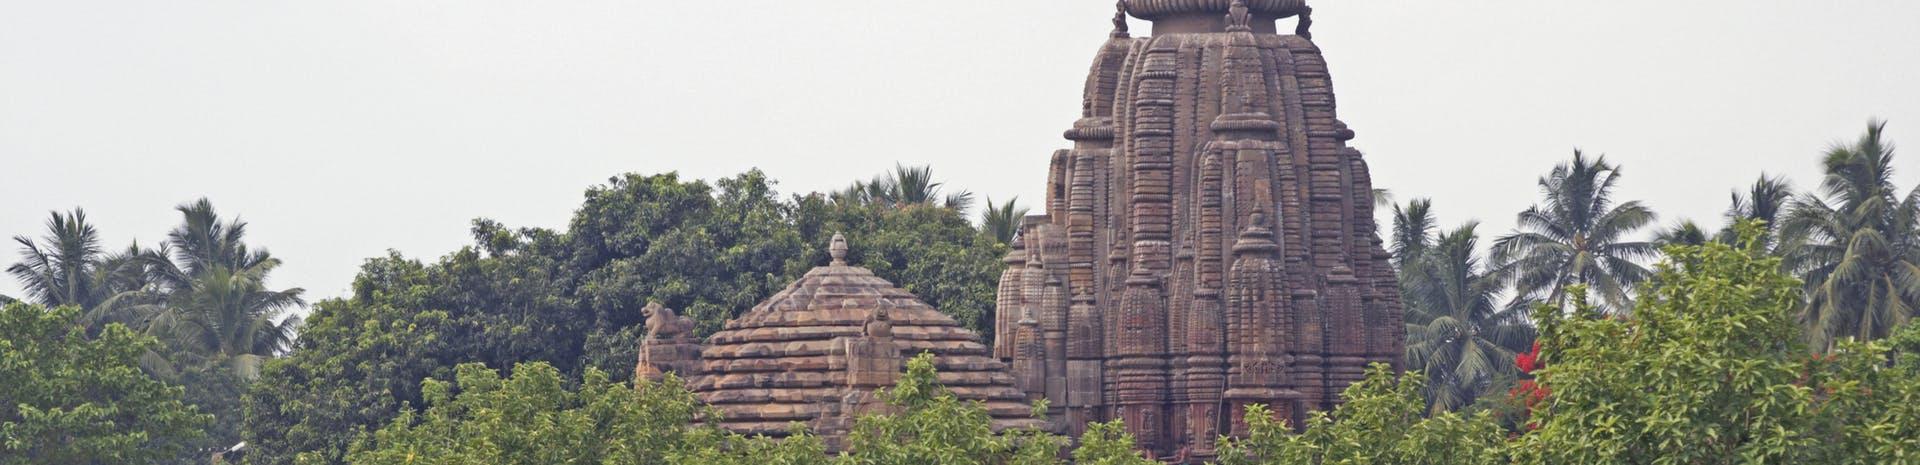 Picture of Bhubaneswar